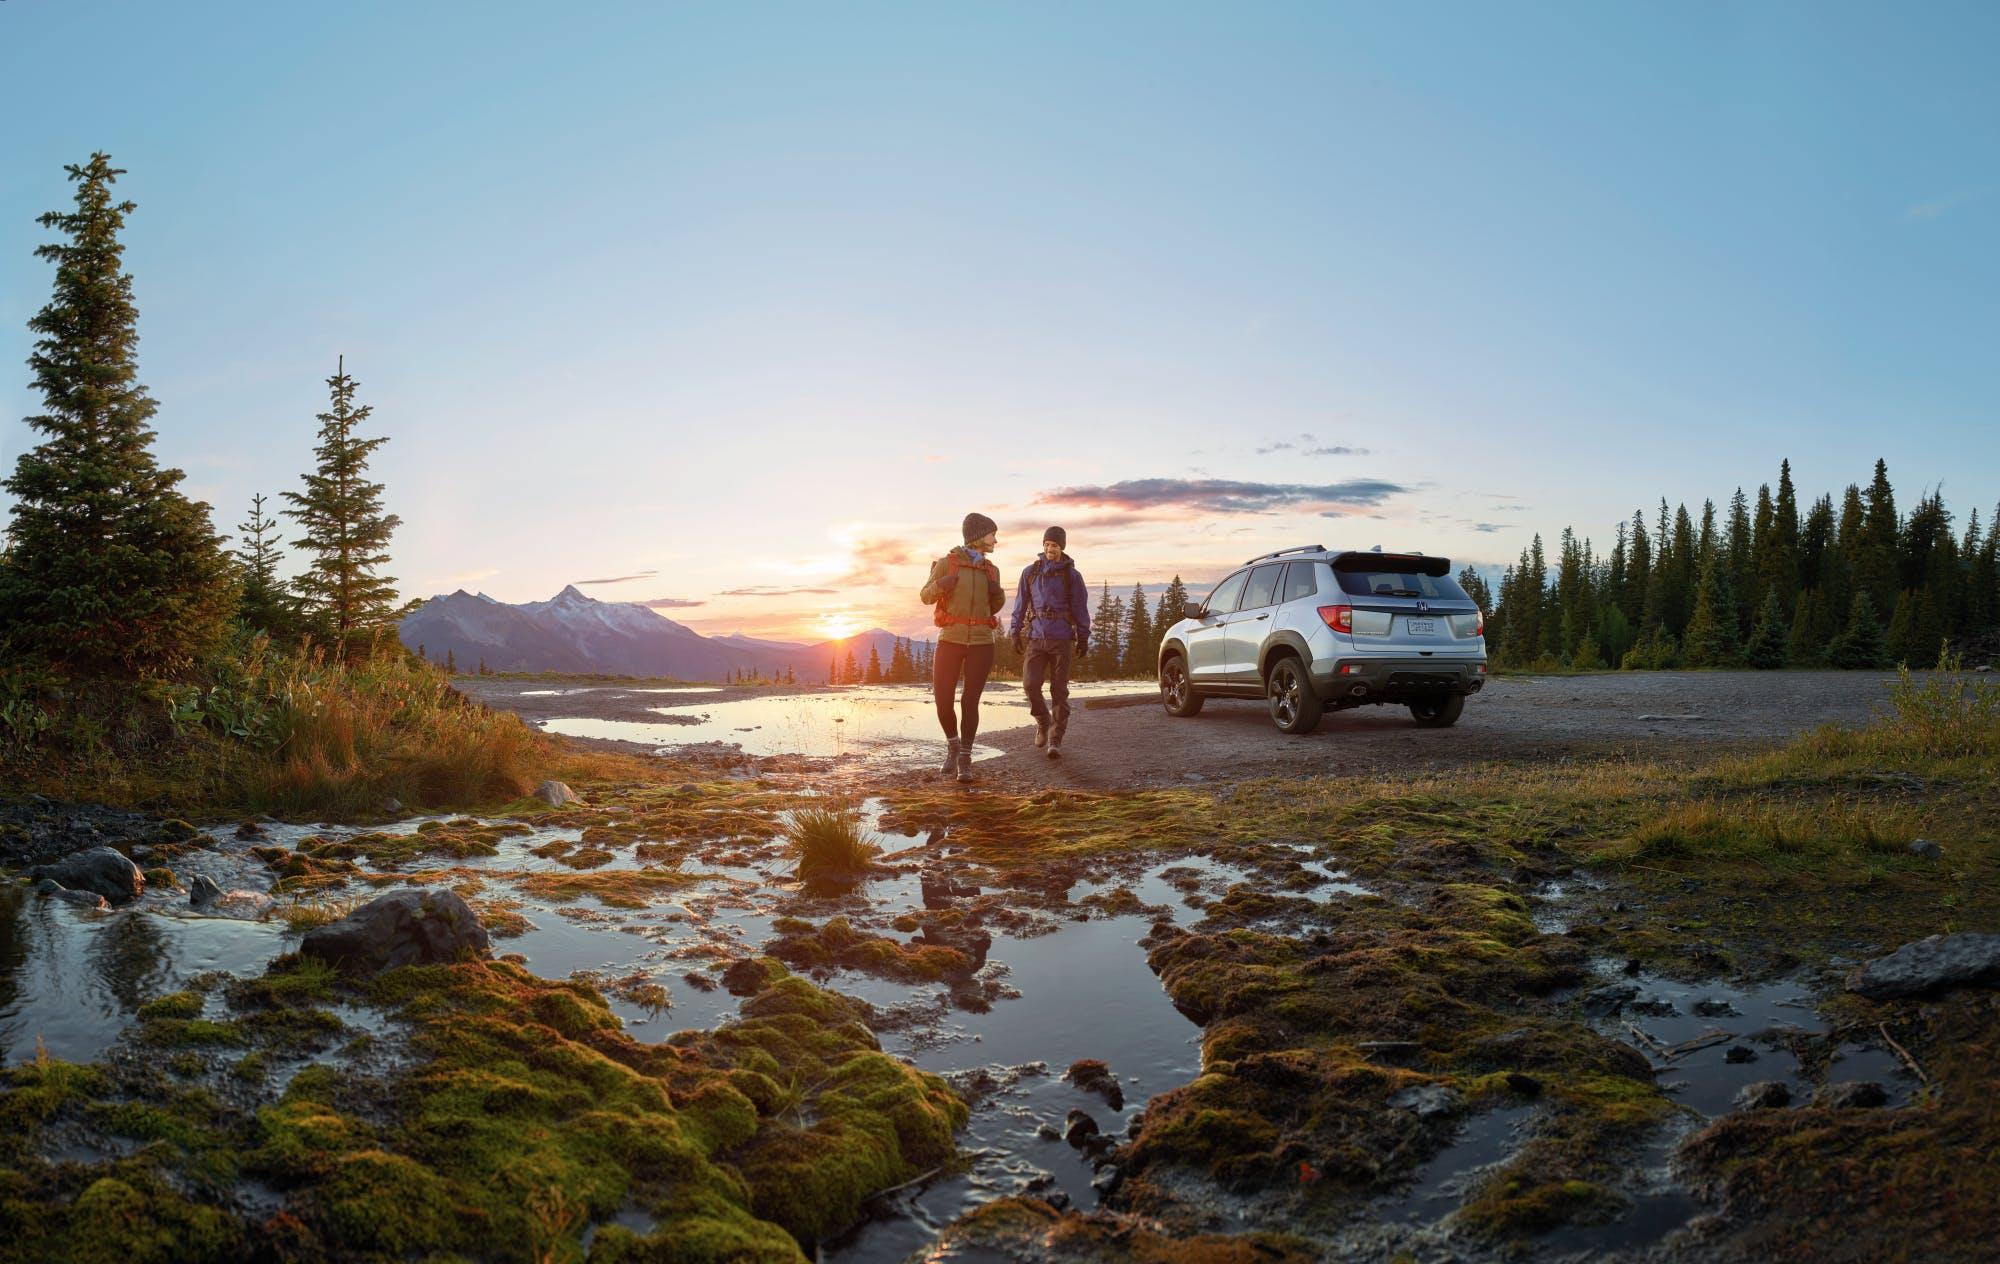 Washington Honda is a Honda Dealership near California, PA | hikers walking near 2020 Honda passport at sunset